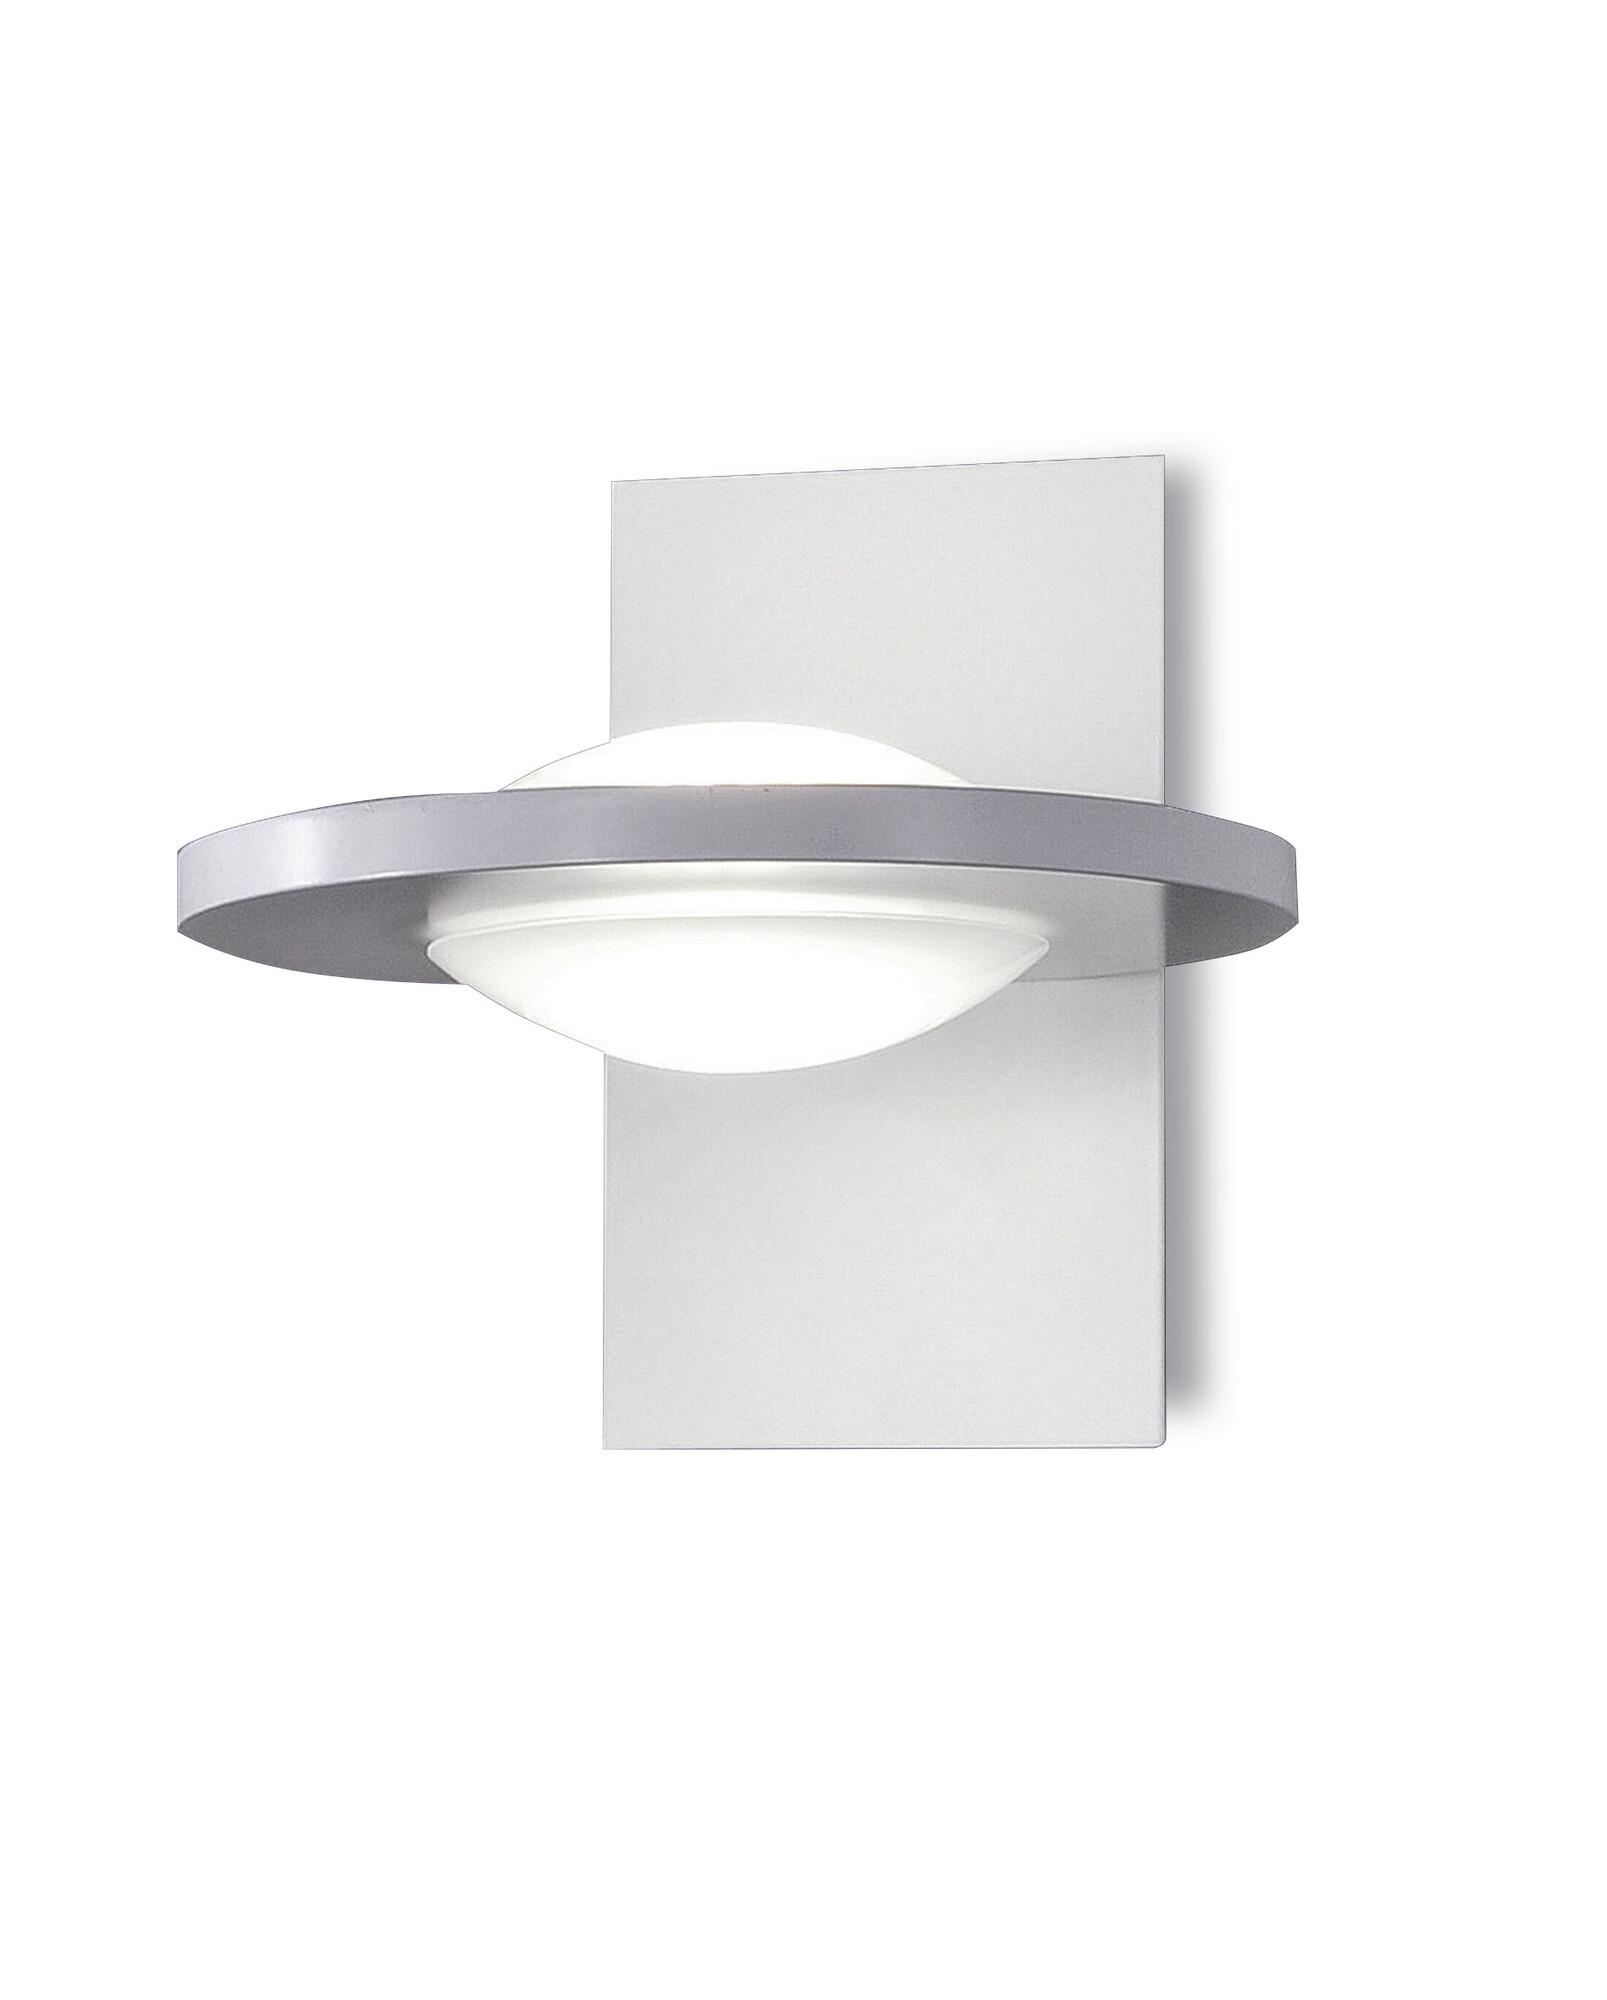 SWAN Wandlamp LED 2x8W/1400lm Wit